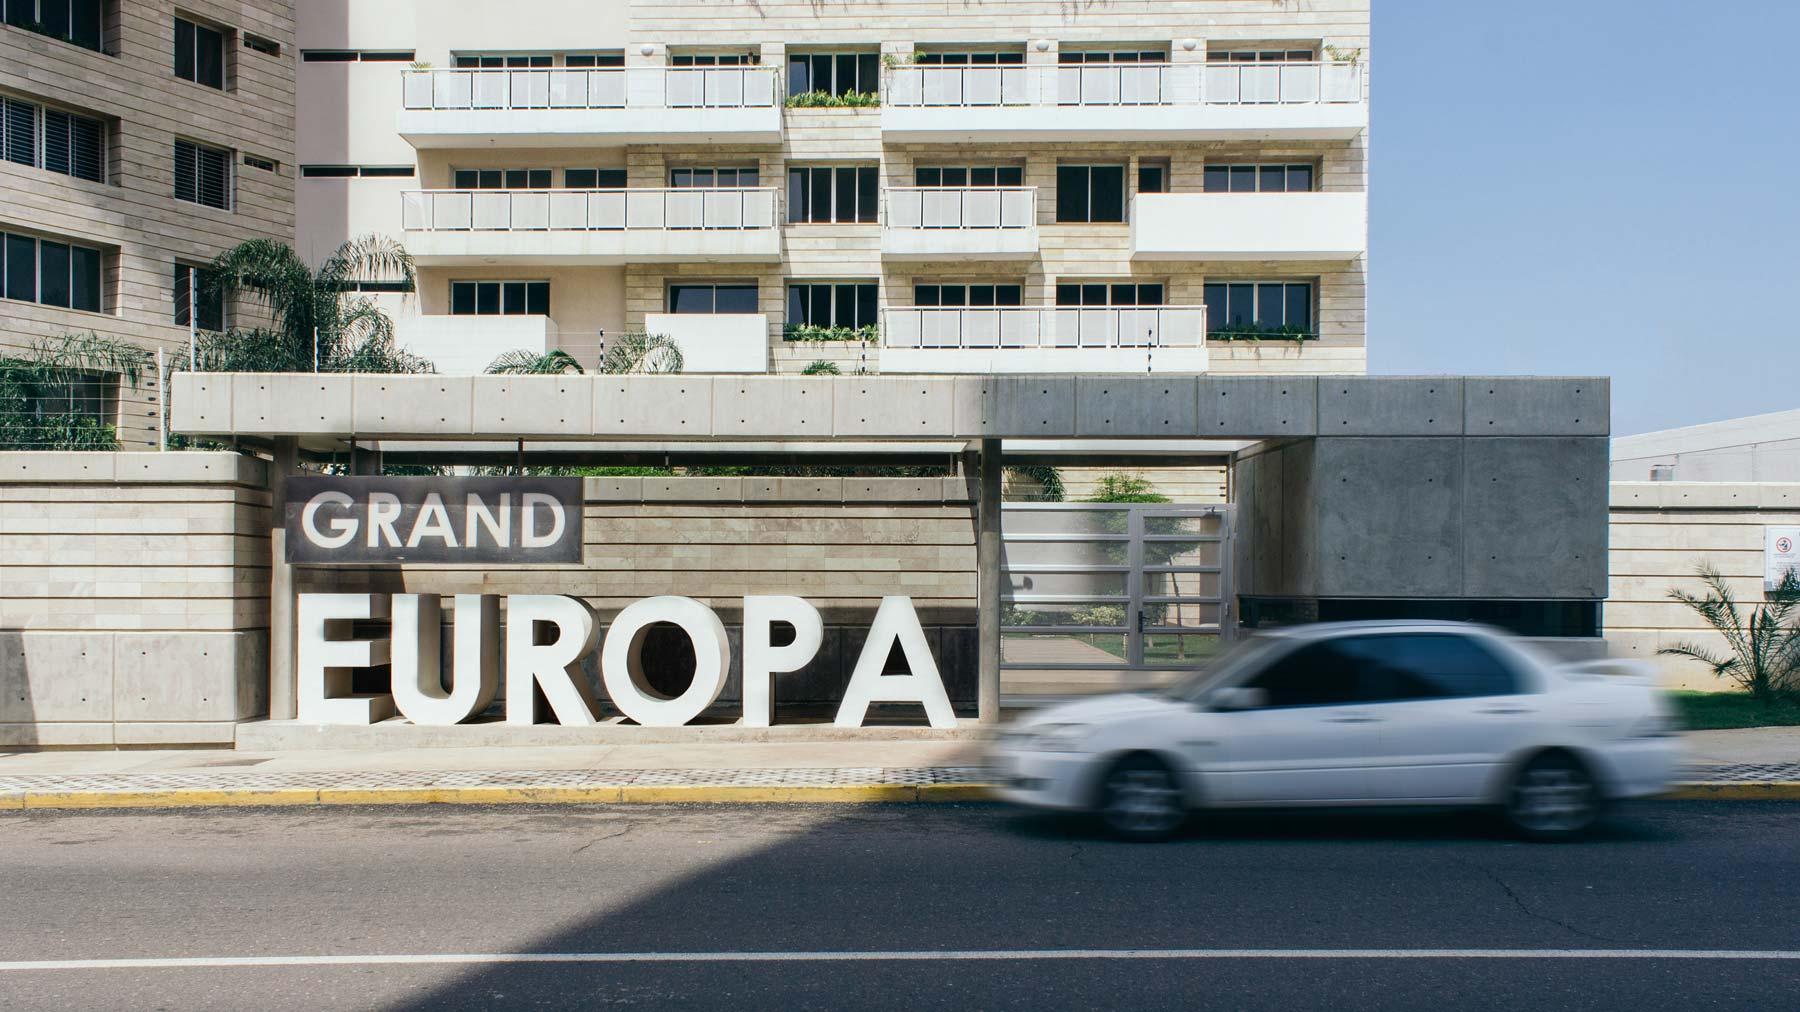 grand-europa-2